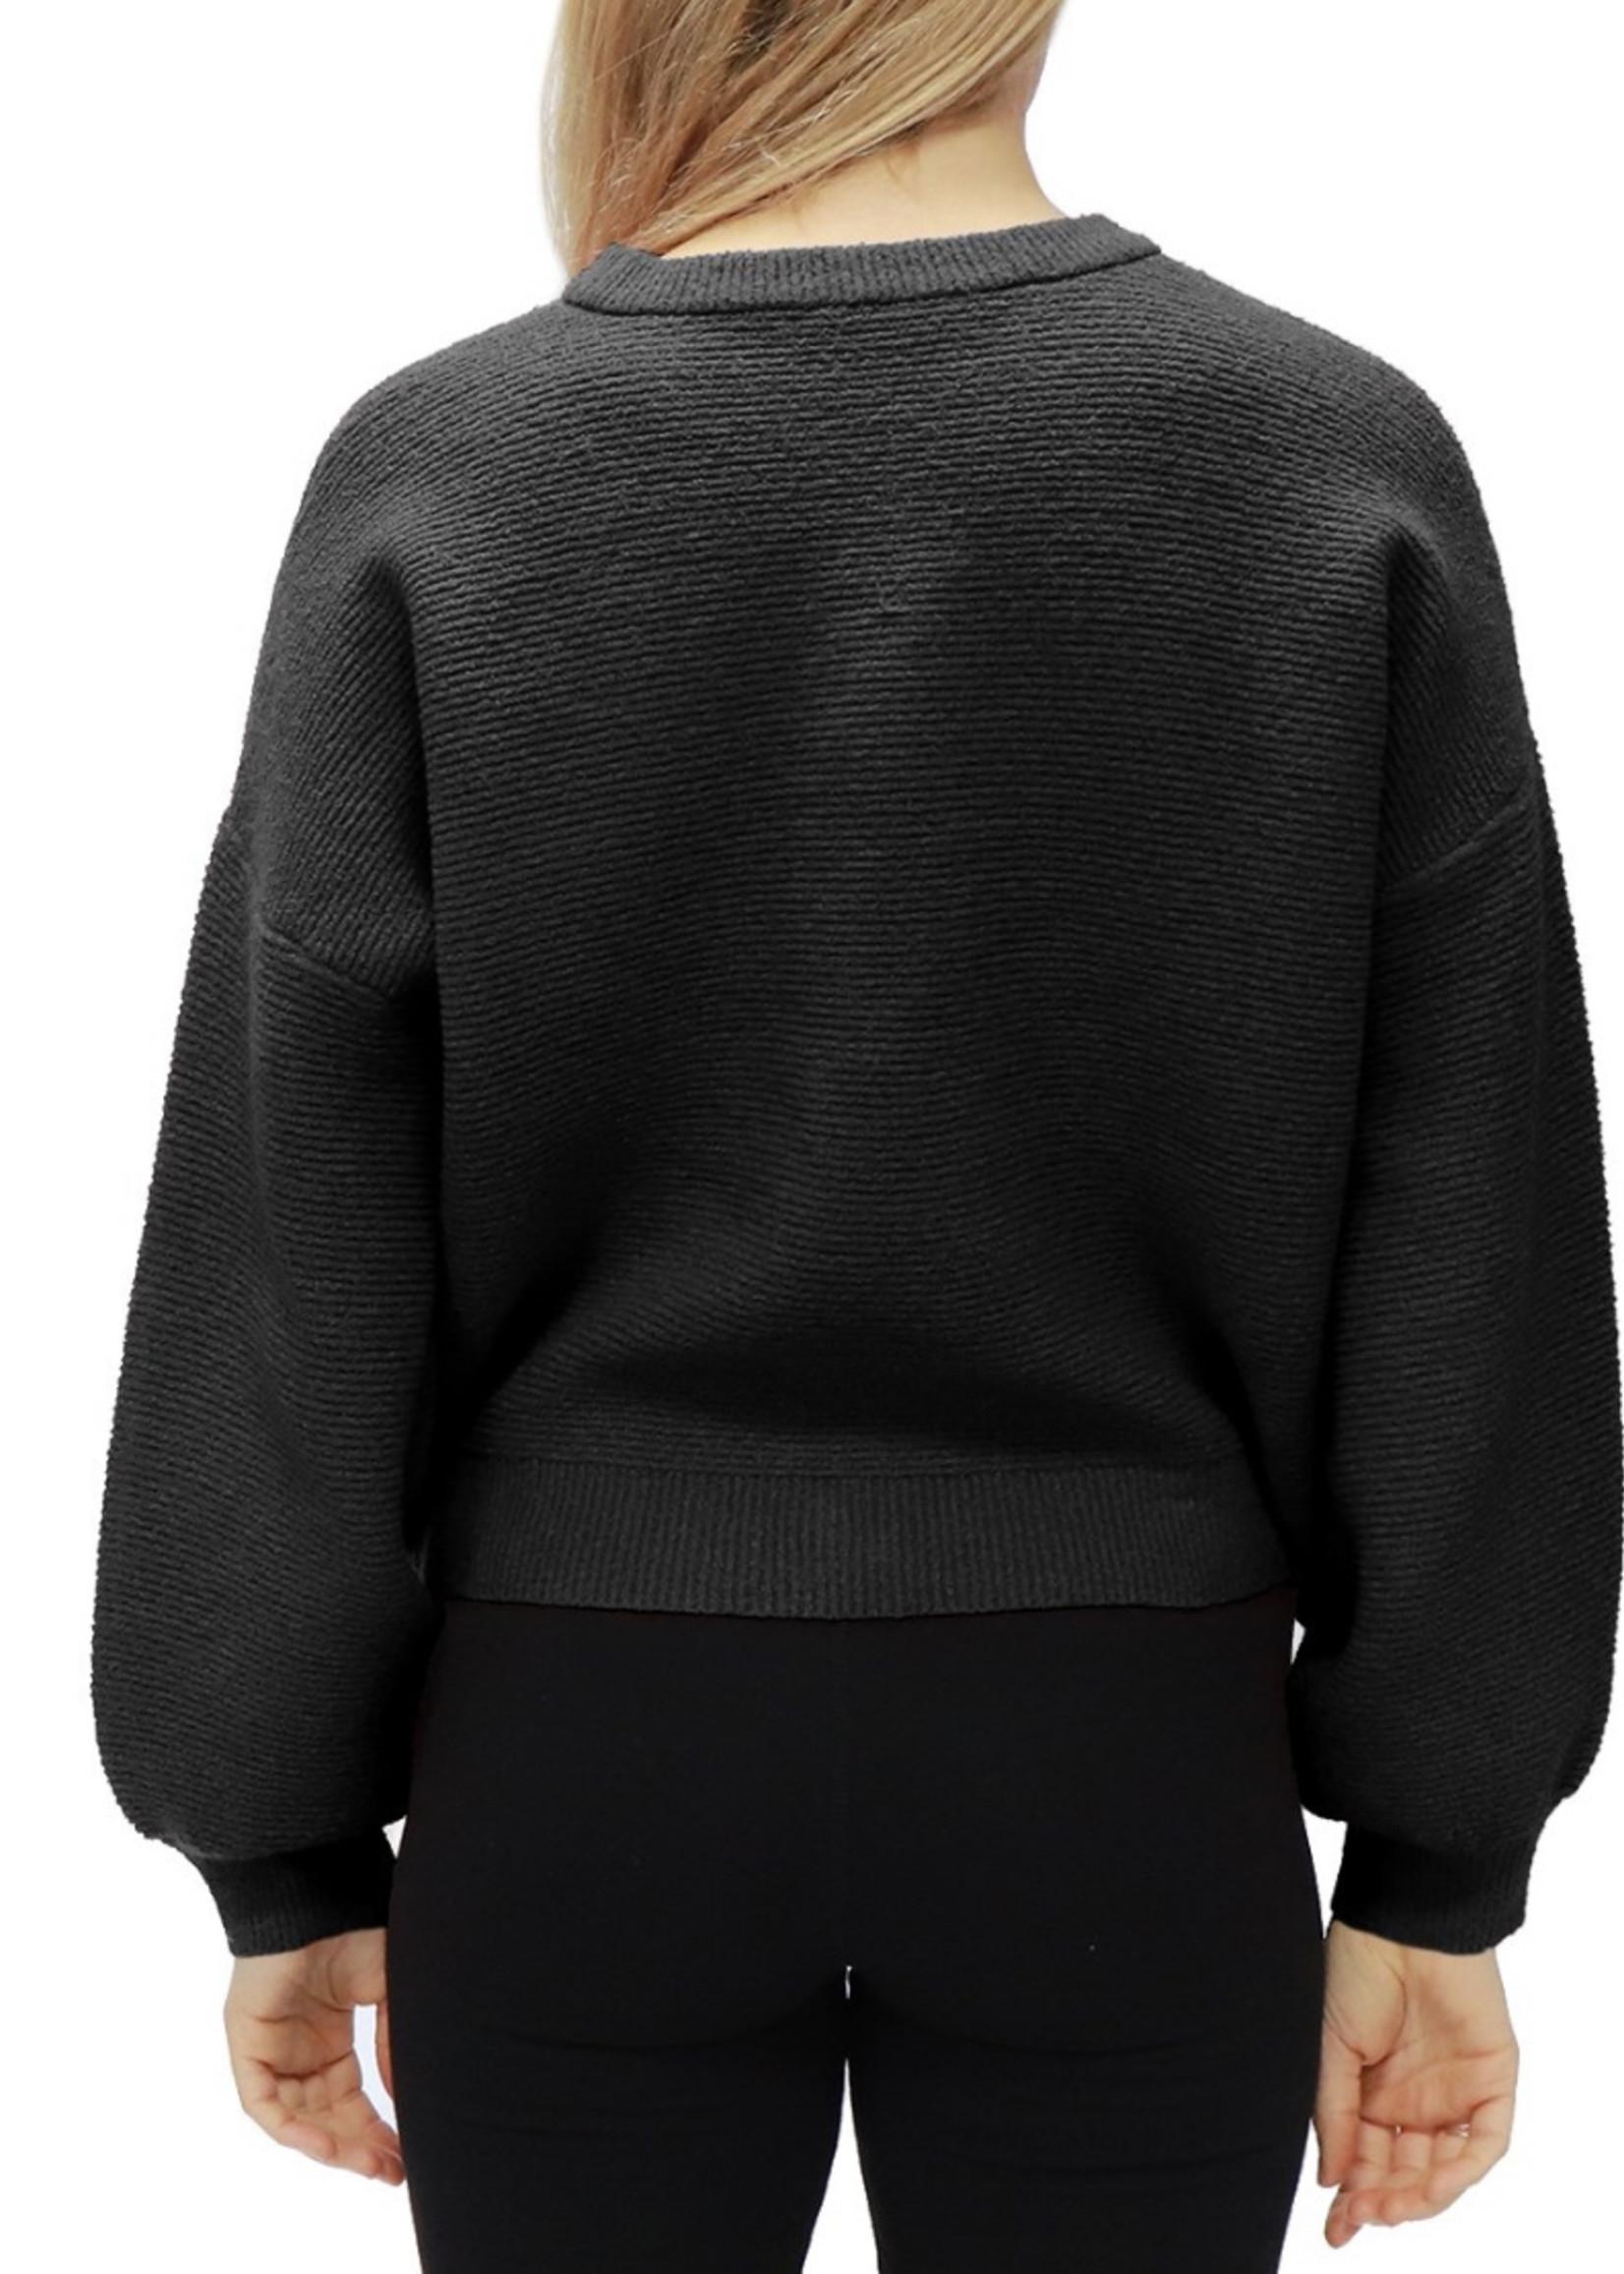 LeBLANC finds Hugh Knit Sweater